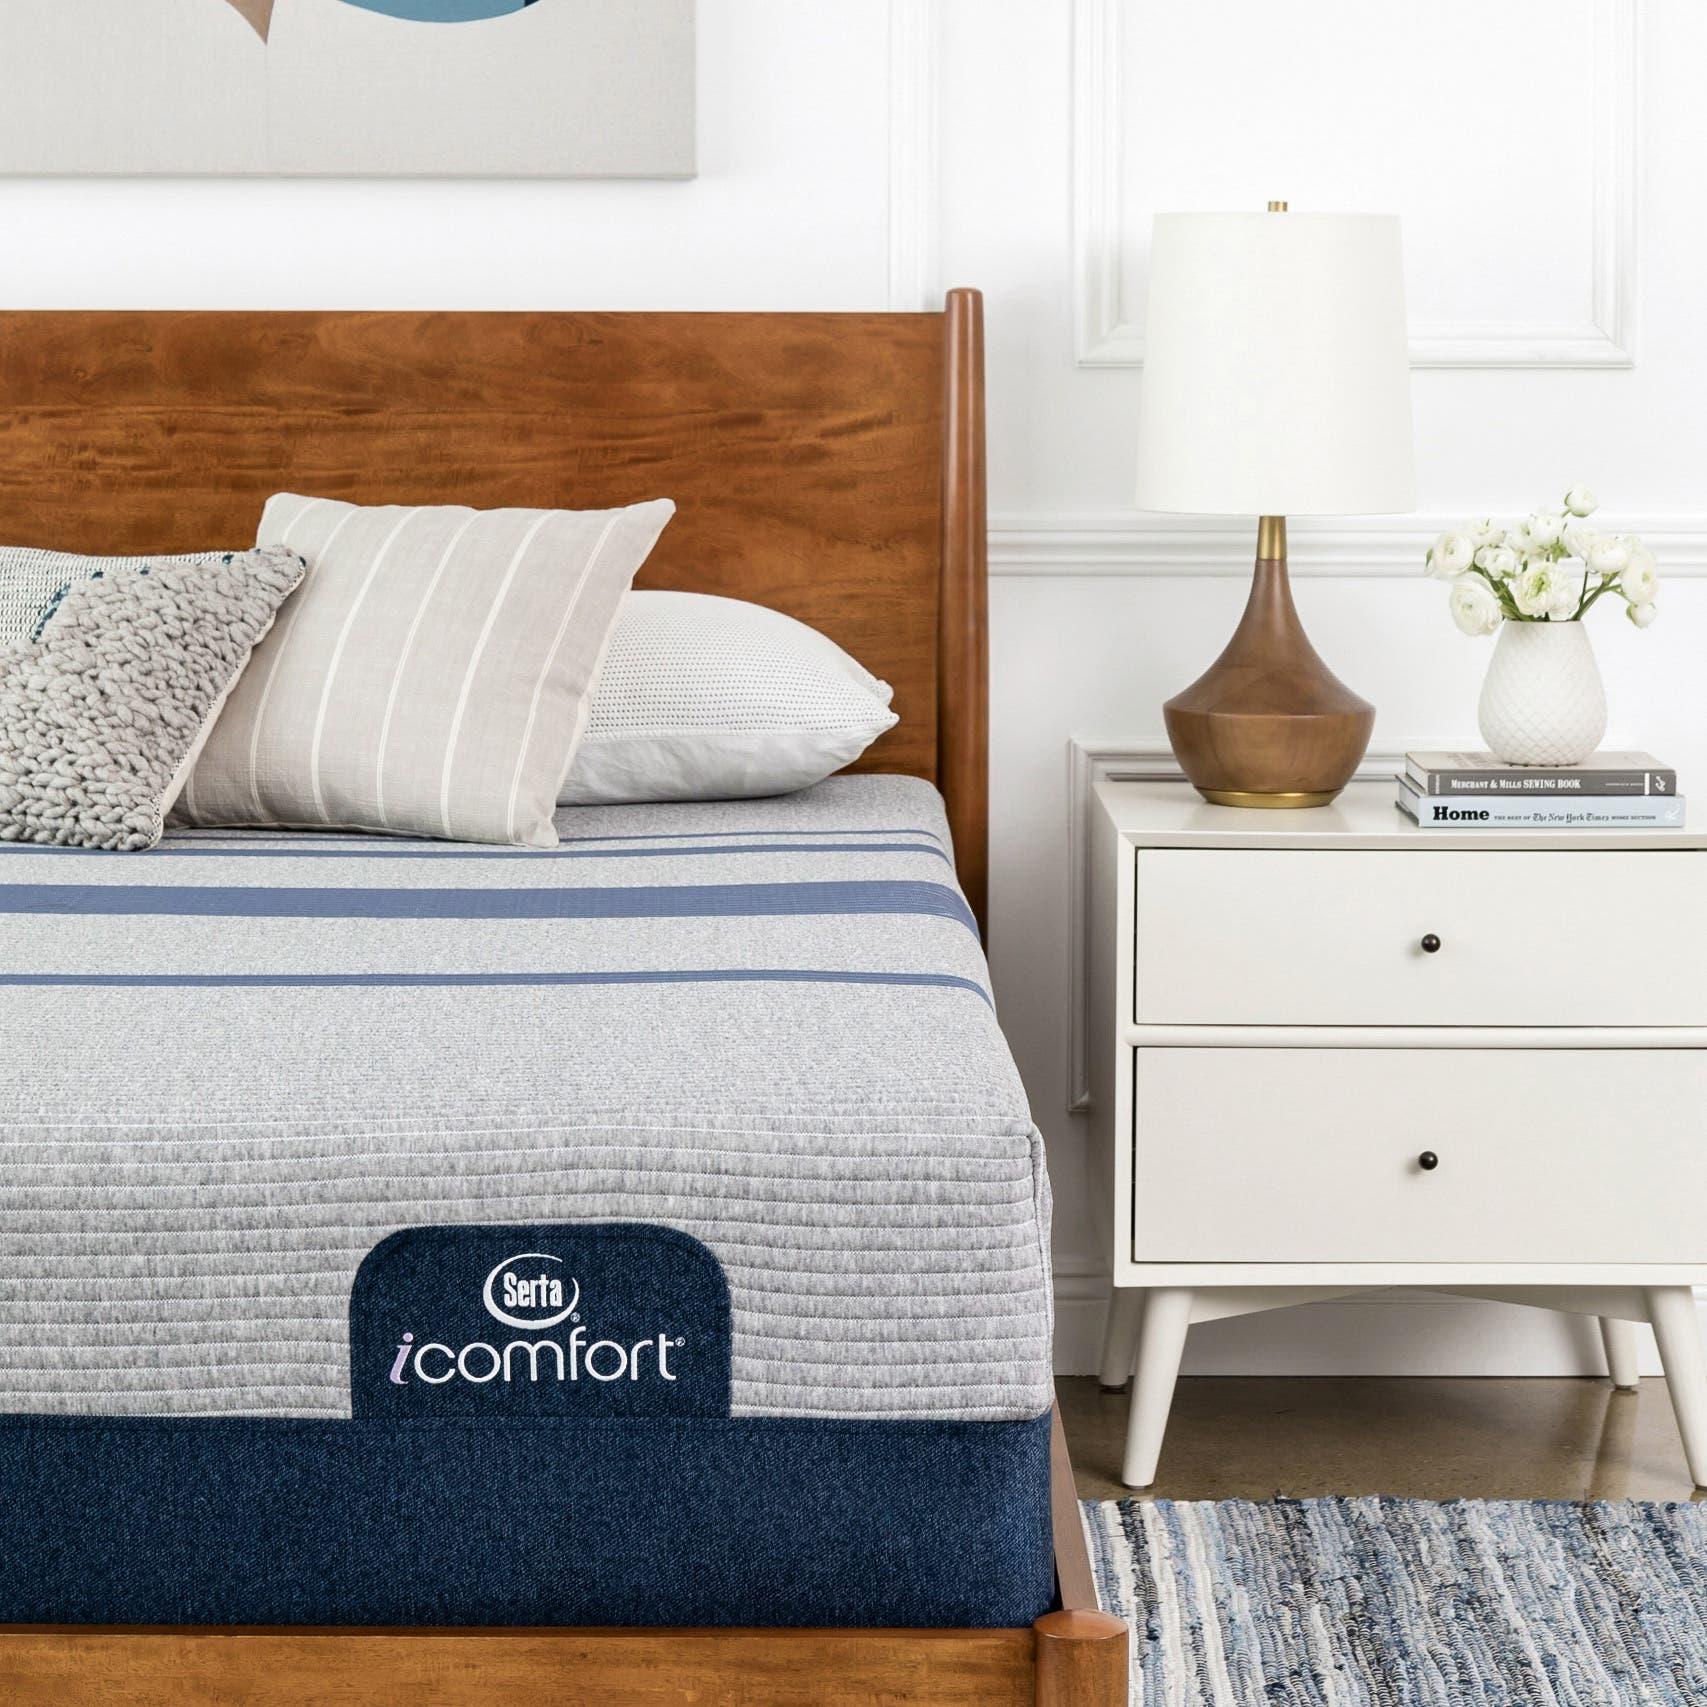 mattresses shop mattresses by size type brands overstock. Black Bedroom Furniture Sets. Home Design Ideas